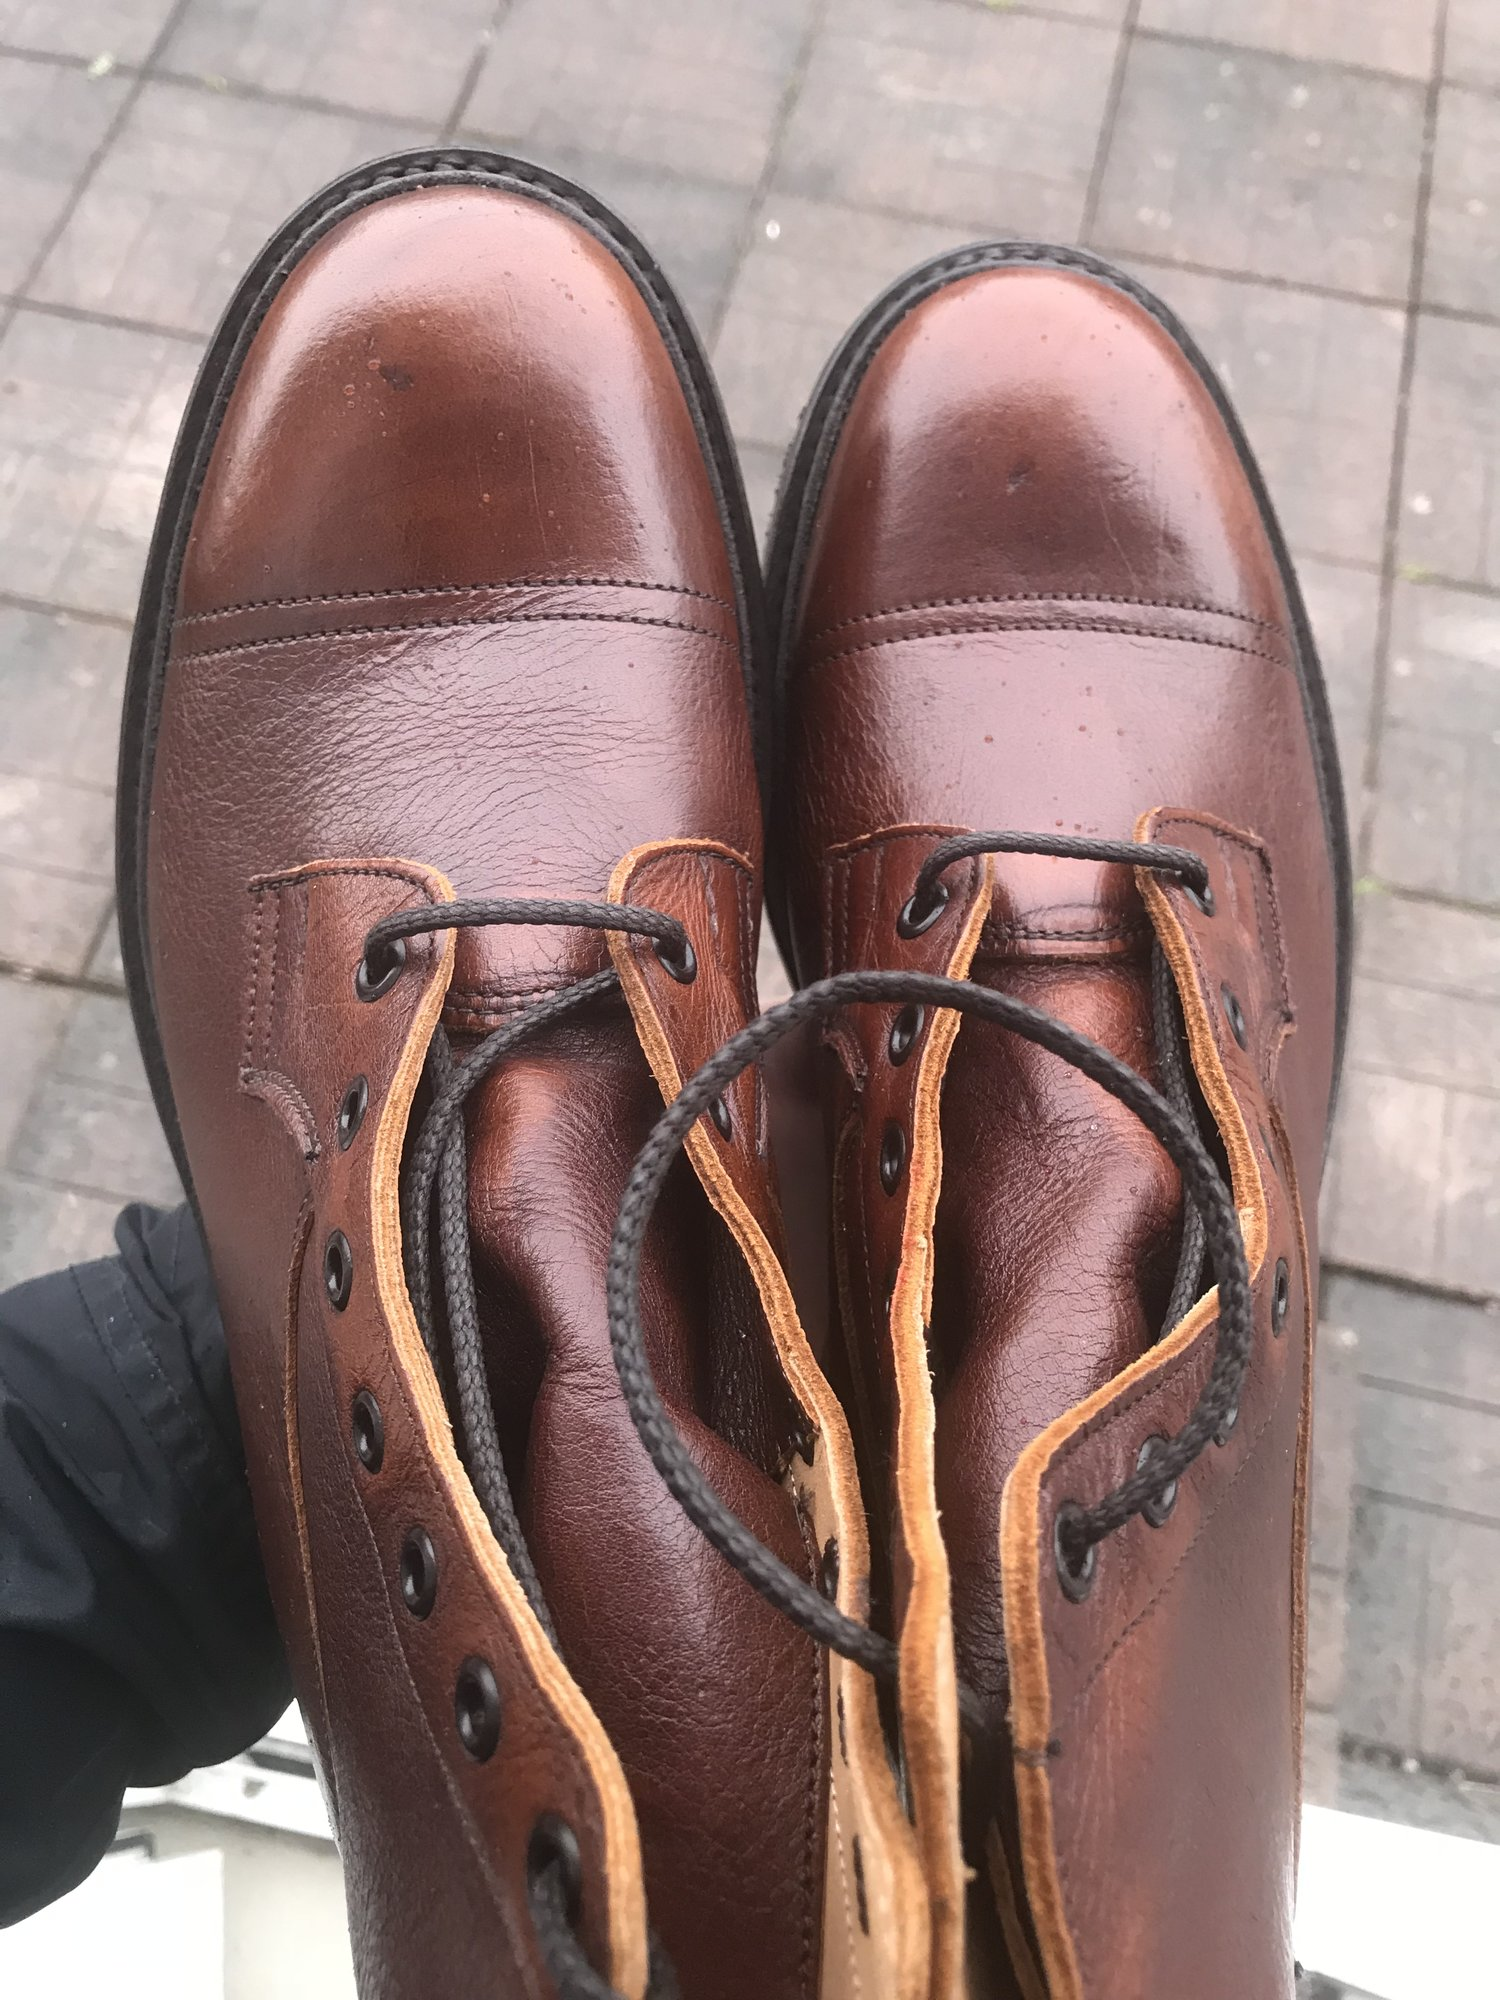 Postman Shoes Toronto